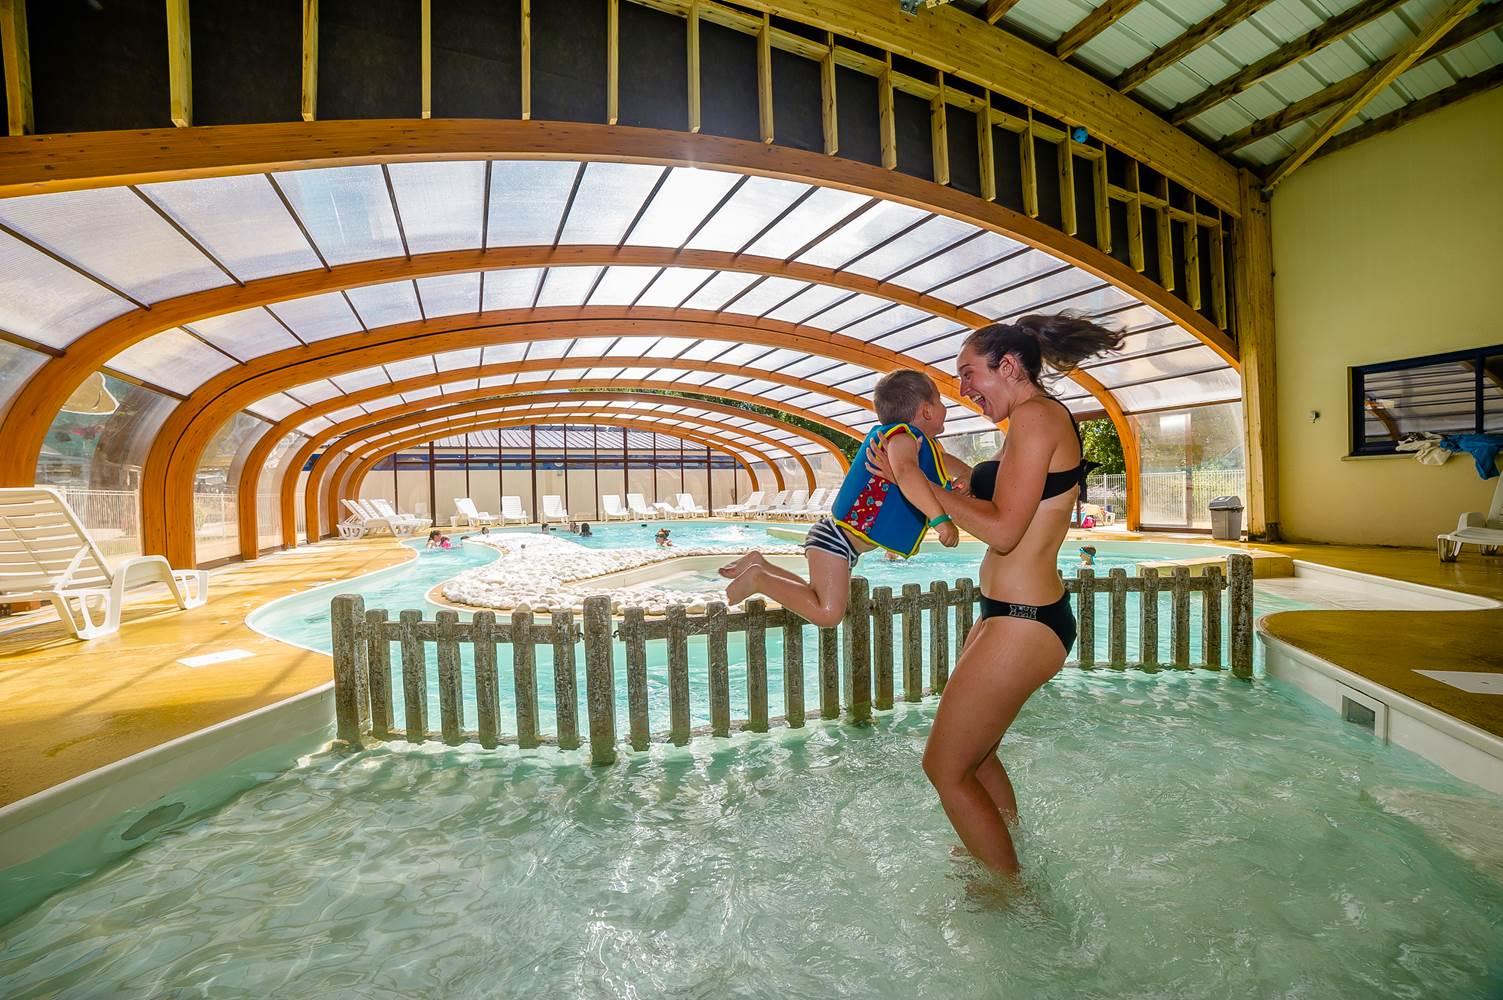 piscine couverte for espagnol ©